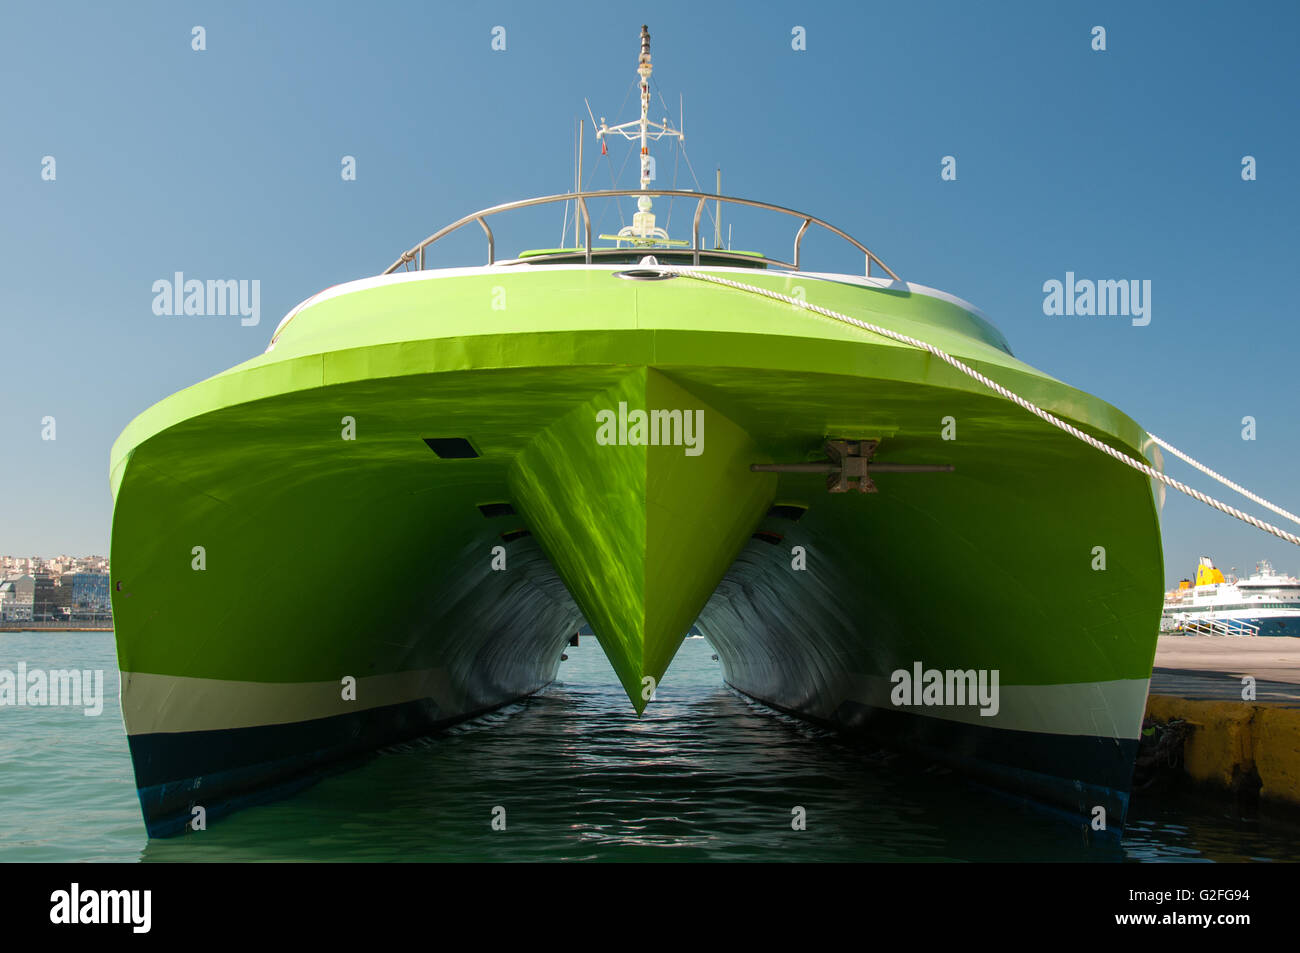 Lime green speedboat ship docked at Piraeus Port in Athens, Greece. - Stock Image